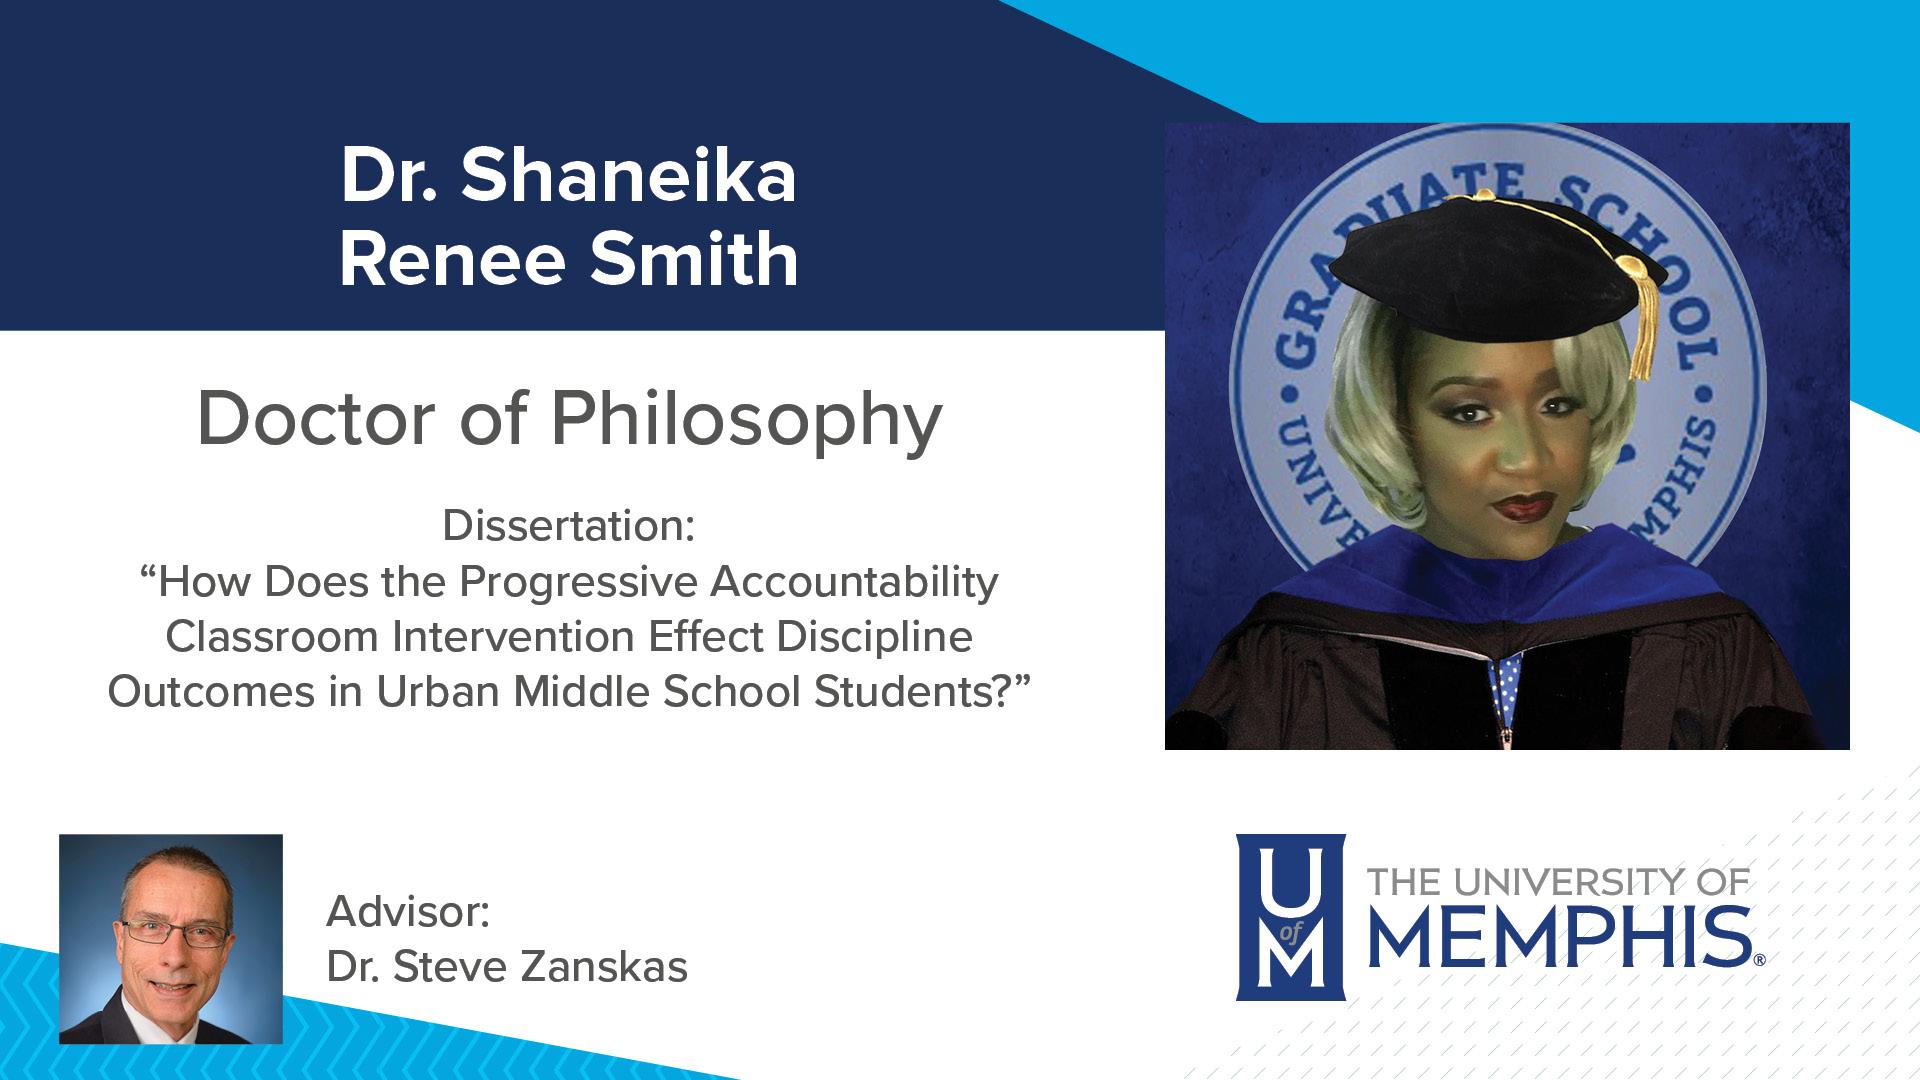 "Dr. Shaneika Renee Smith Dissertation: ""How does the Progressive Accountability Classroom Intervention Effect Discipline Outcomes in Urban Middle School Students?"" Major Professor: Dr. Steve Zanskas"